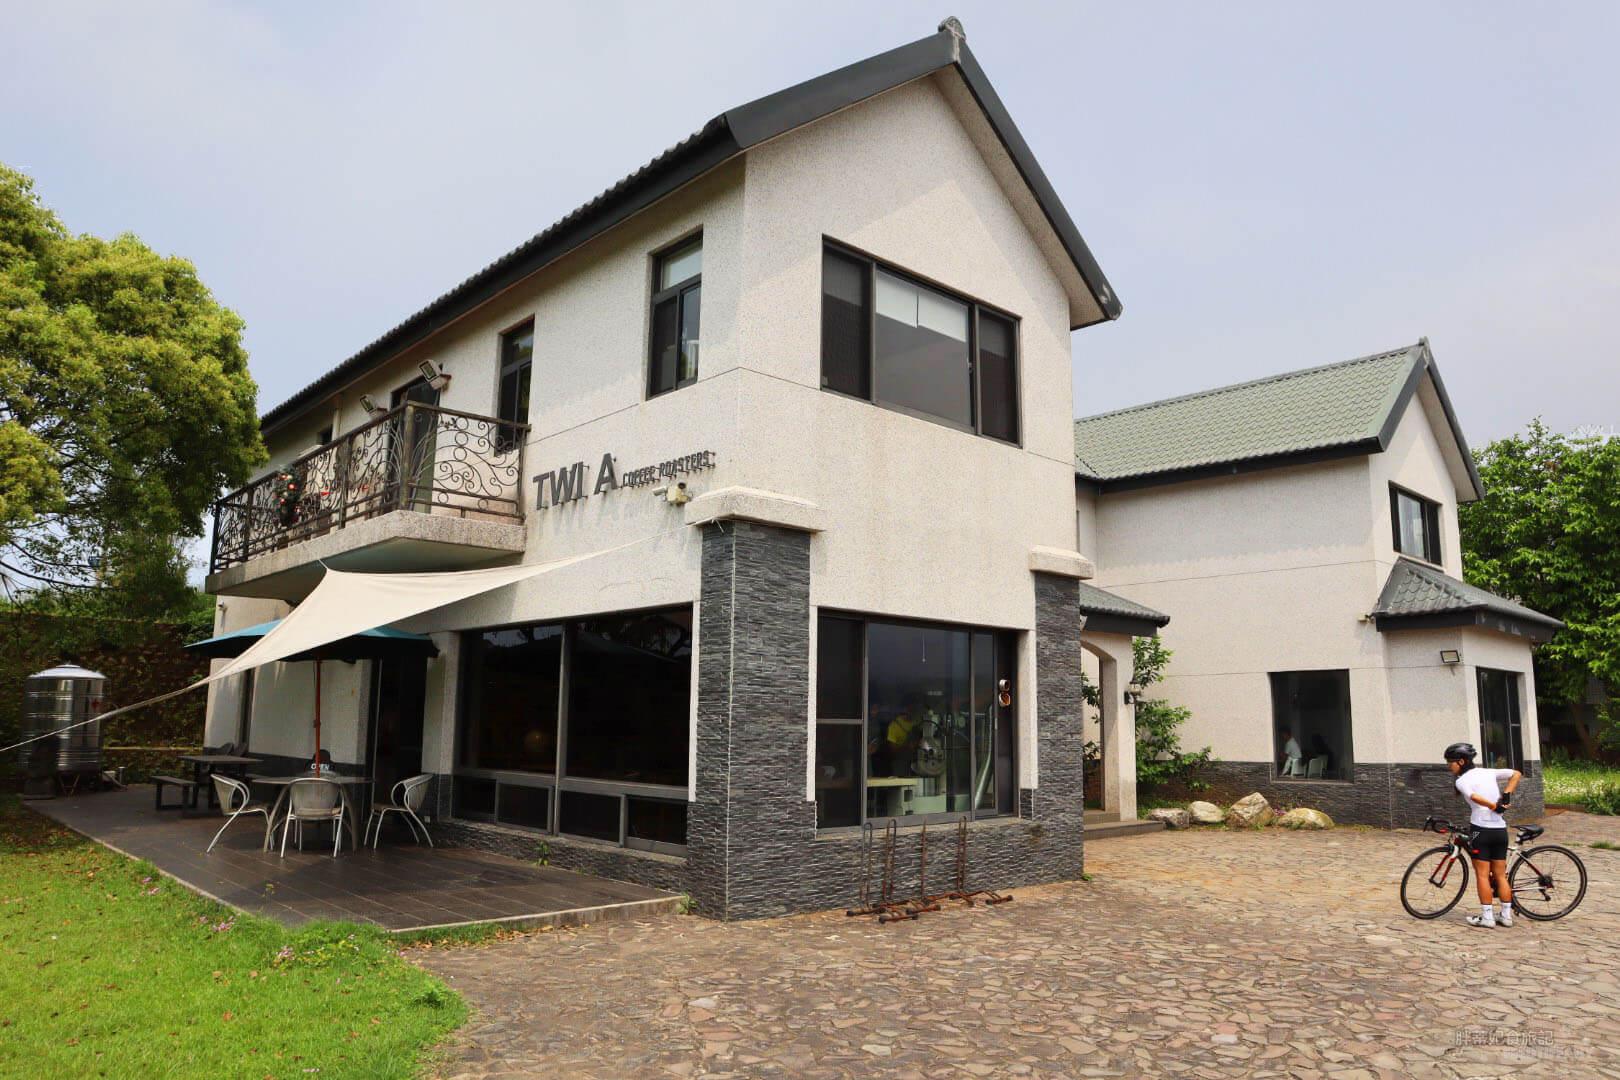 Twi A錘子咖啡烘焙坊 的民宅建築,莊園感。